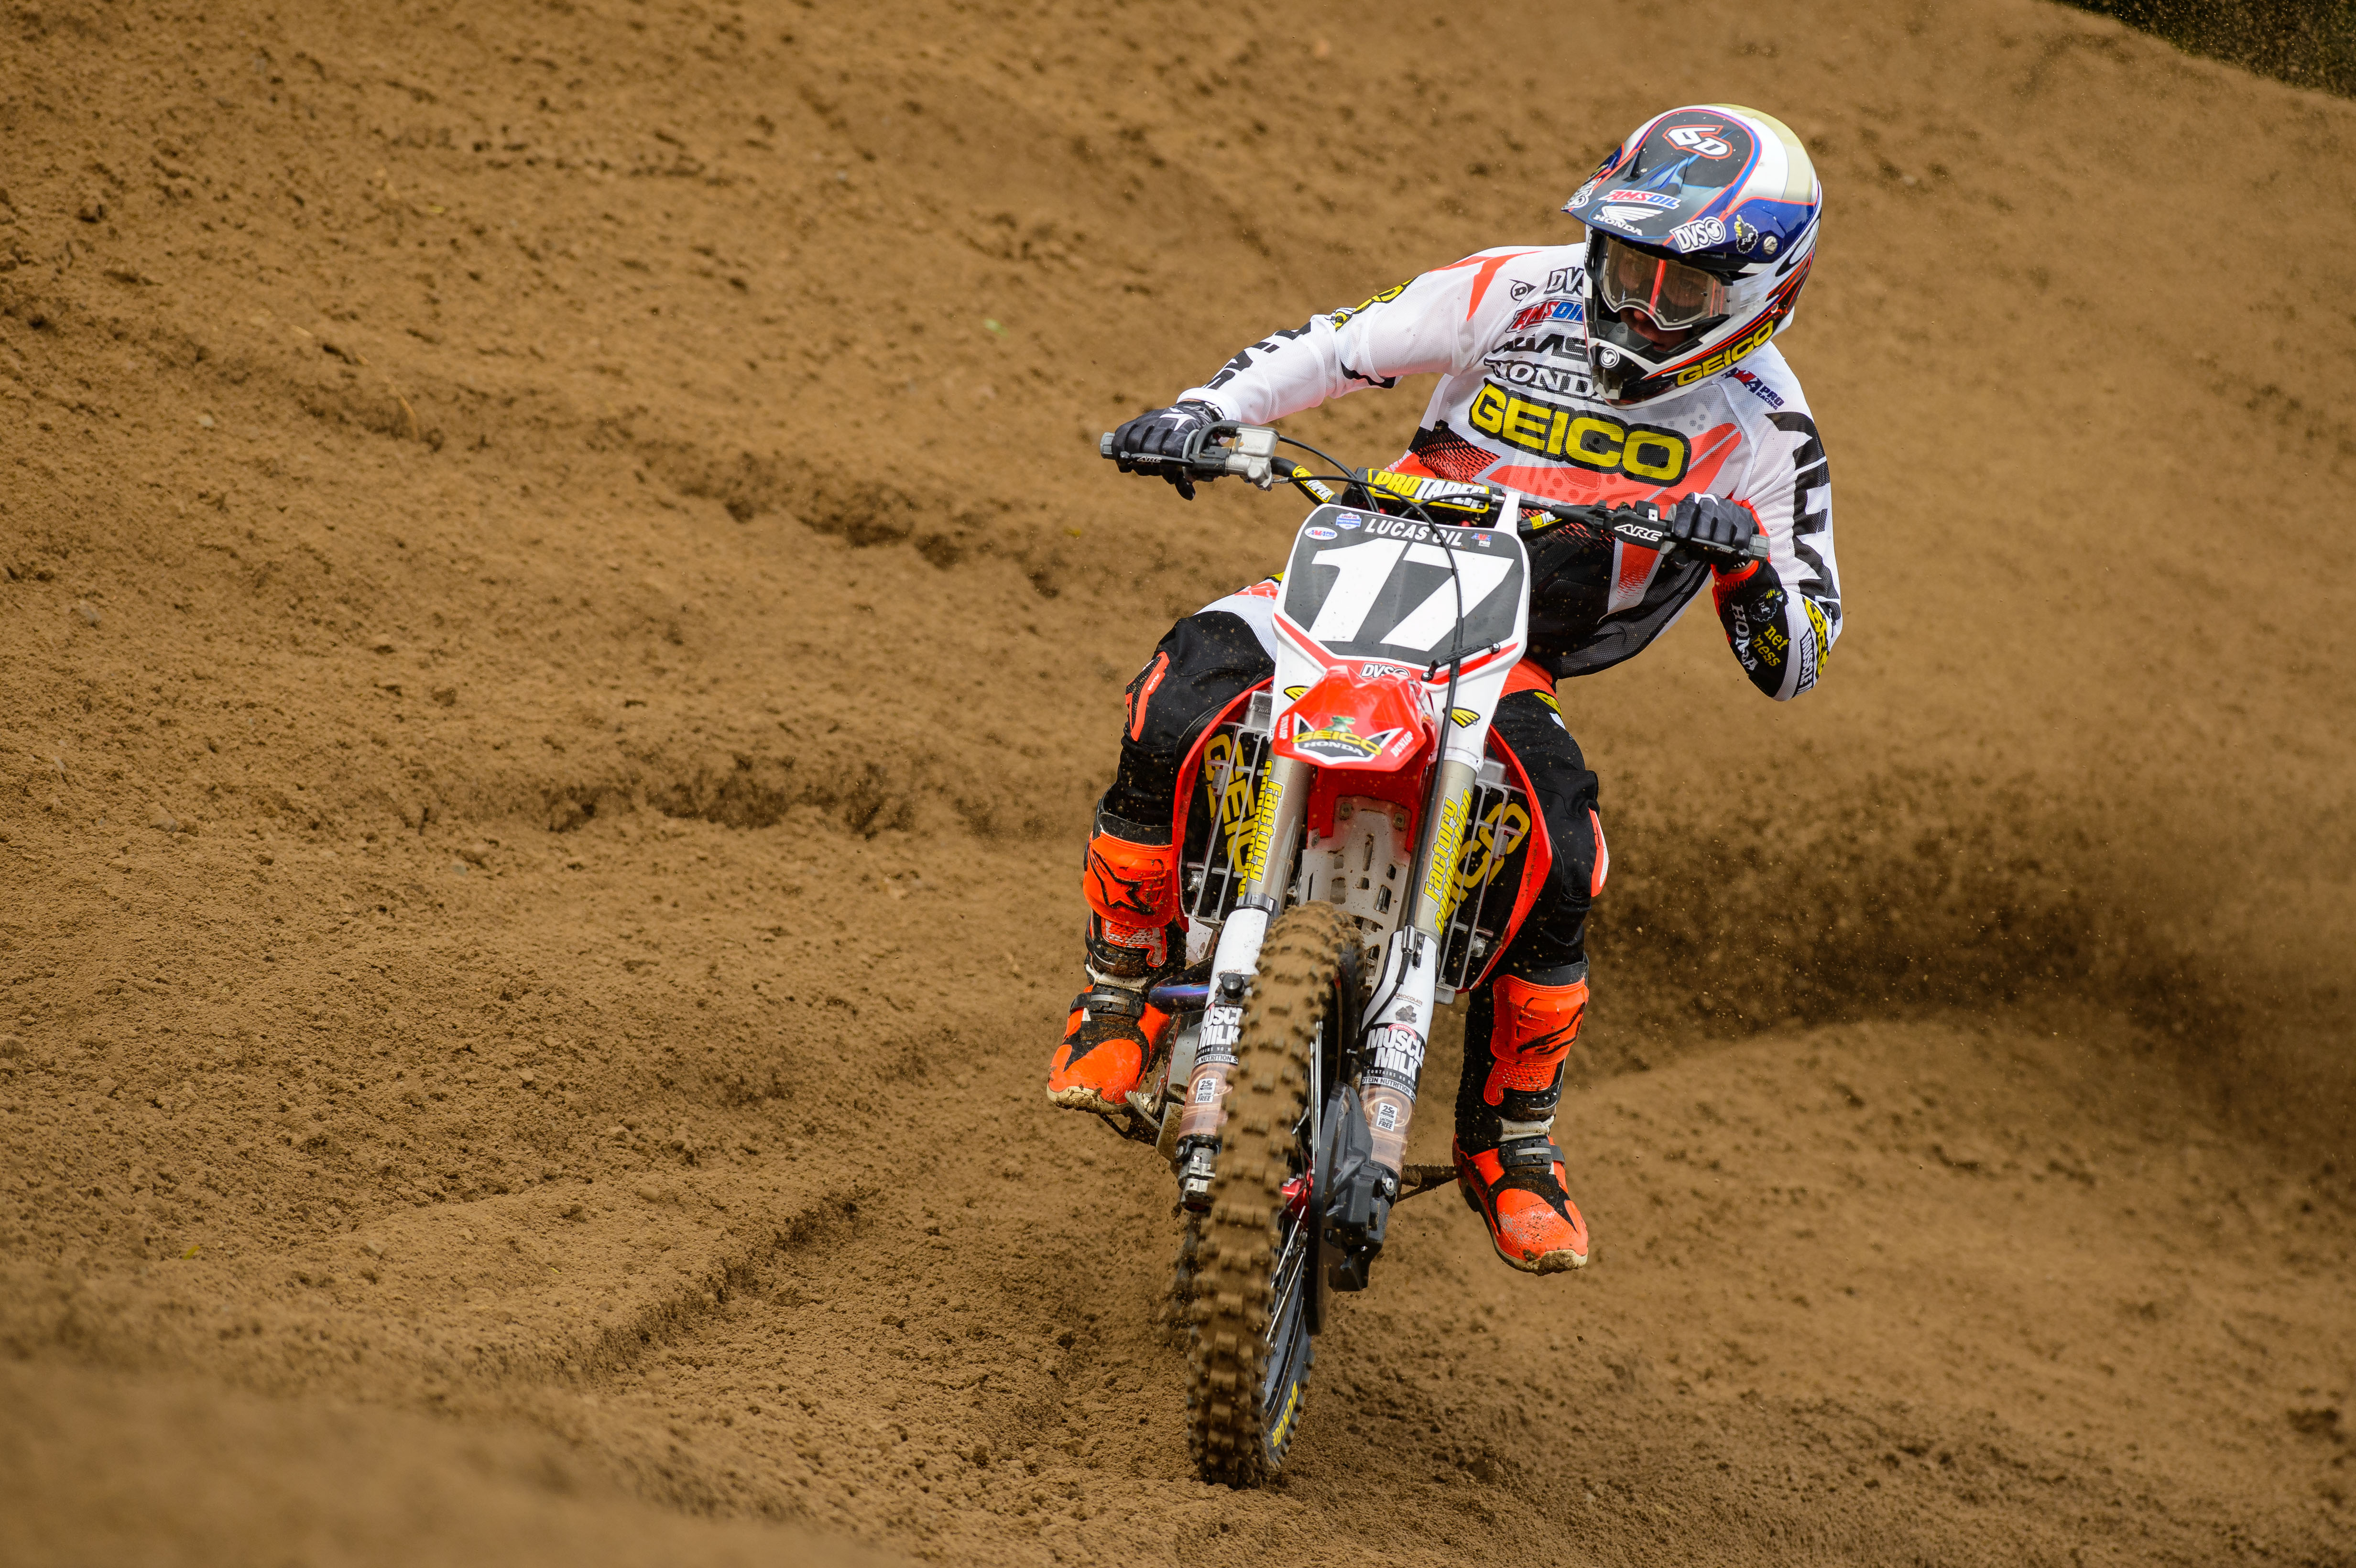 Dirtbike Moto Motocross Race Racing Motorbike Honda